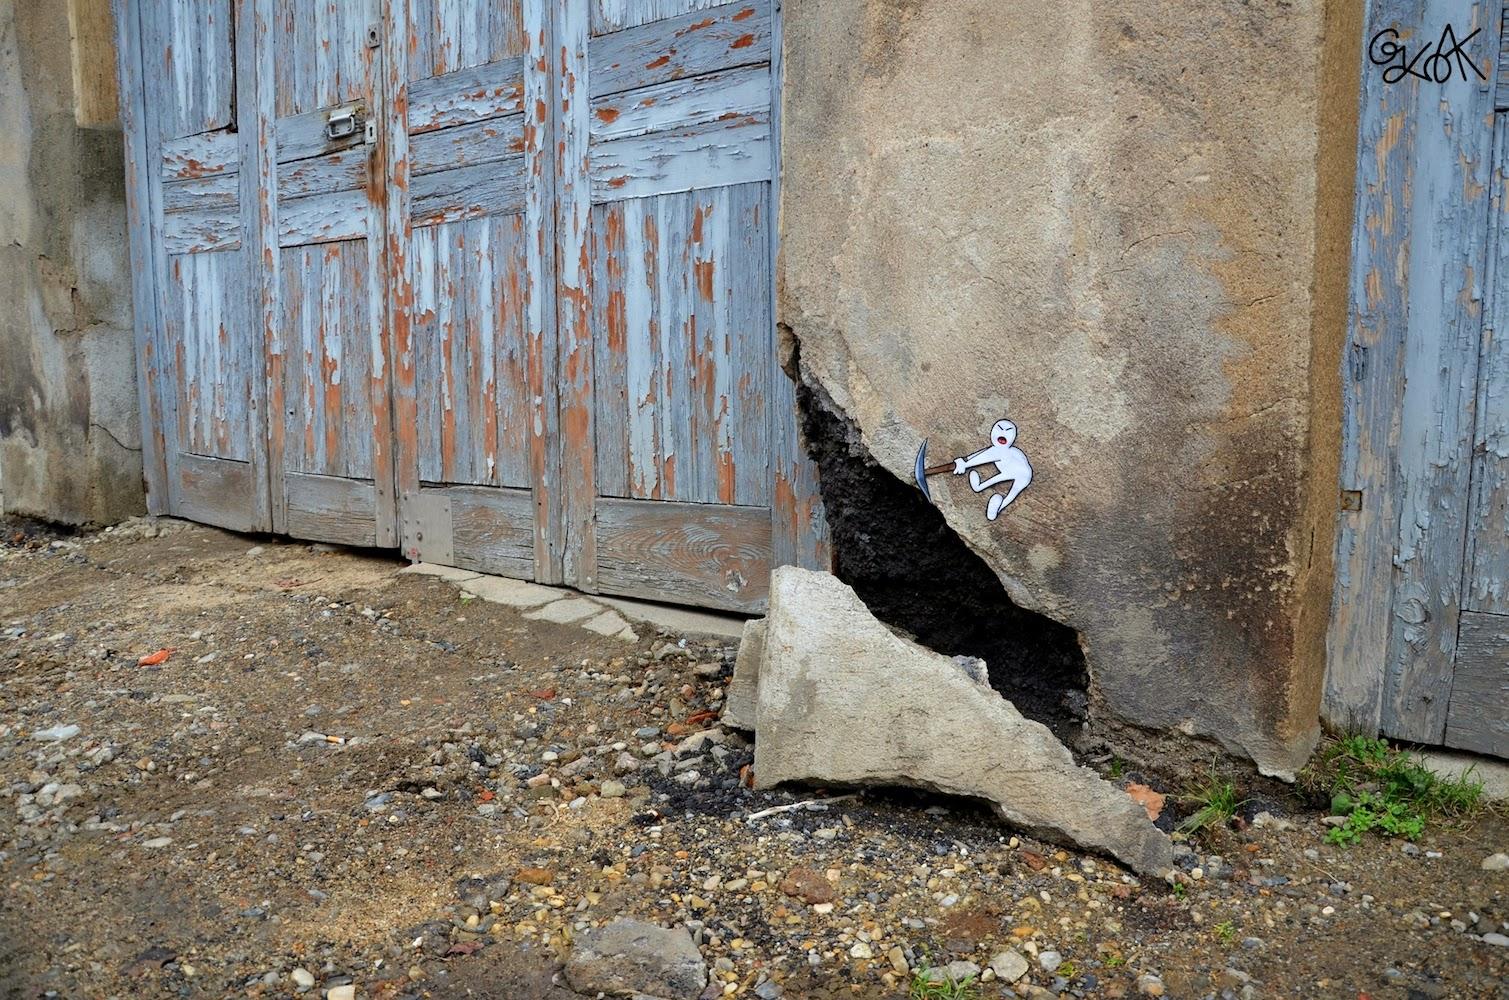 """Pickaxe Head"" New Street Piece by OakOak somewhere in his hometown of Saint Etienne, France. 2"